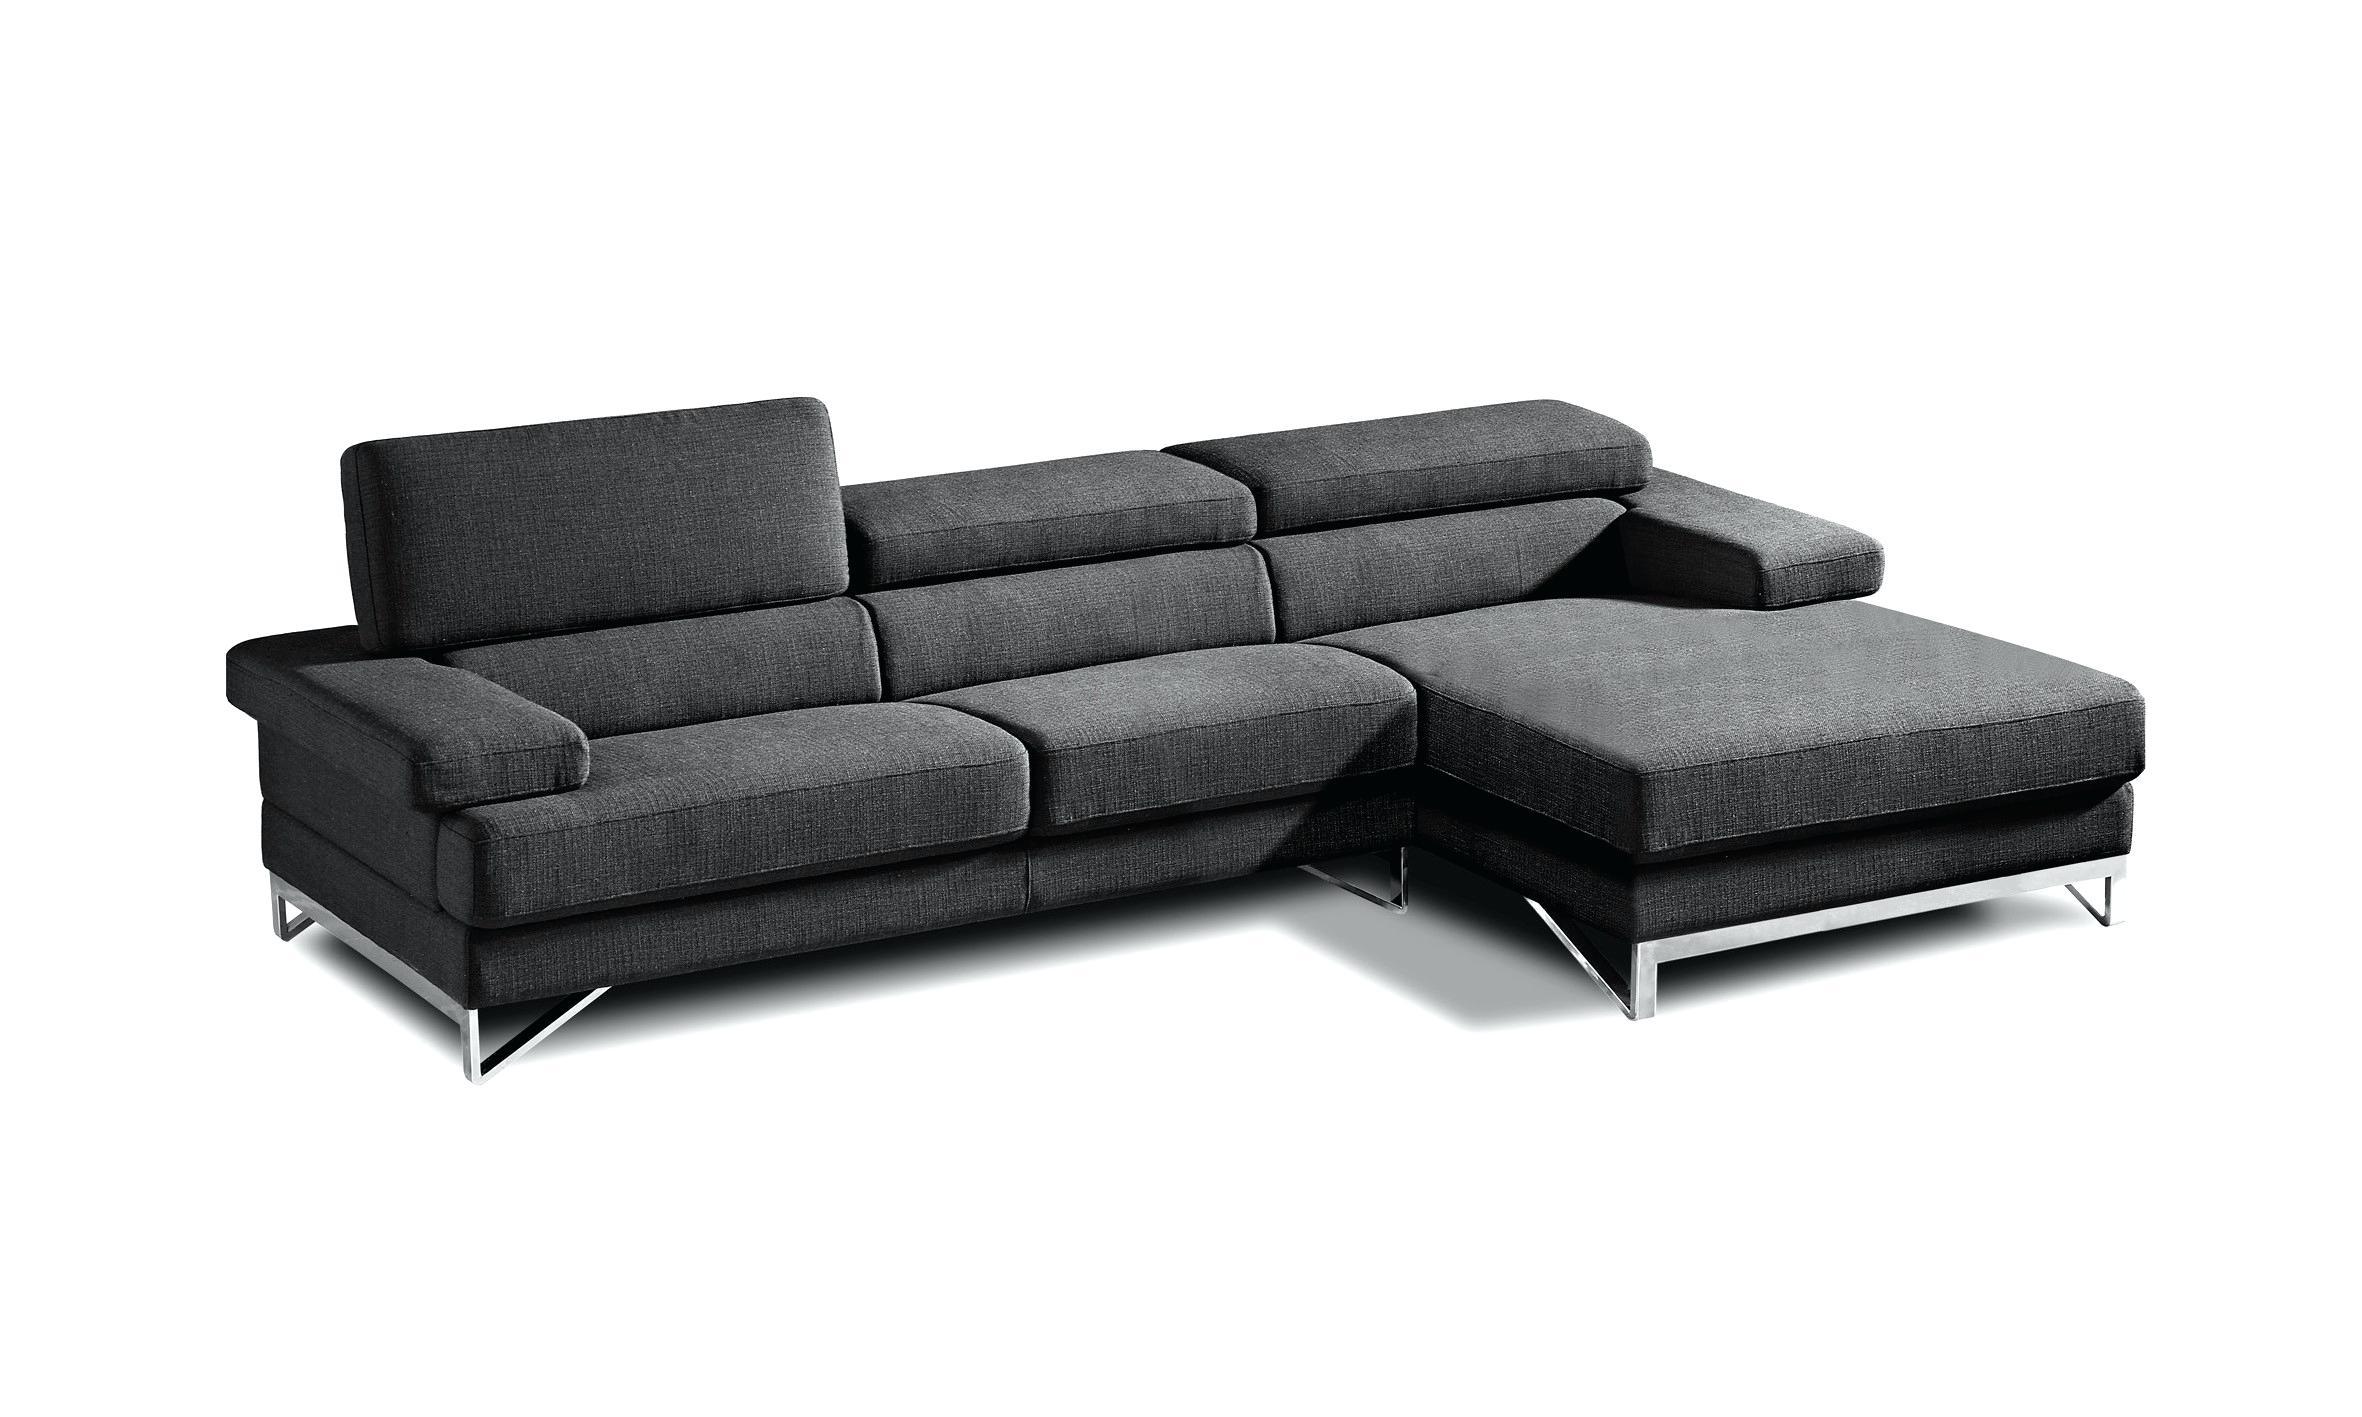 tufted leather sofa edmonton la z boy motion bed livingroom wonderful